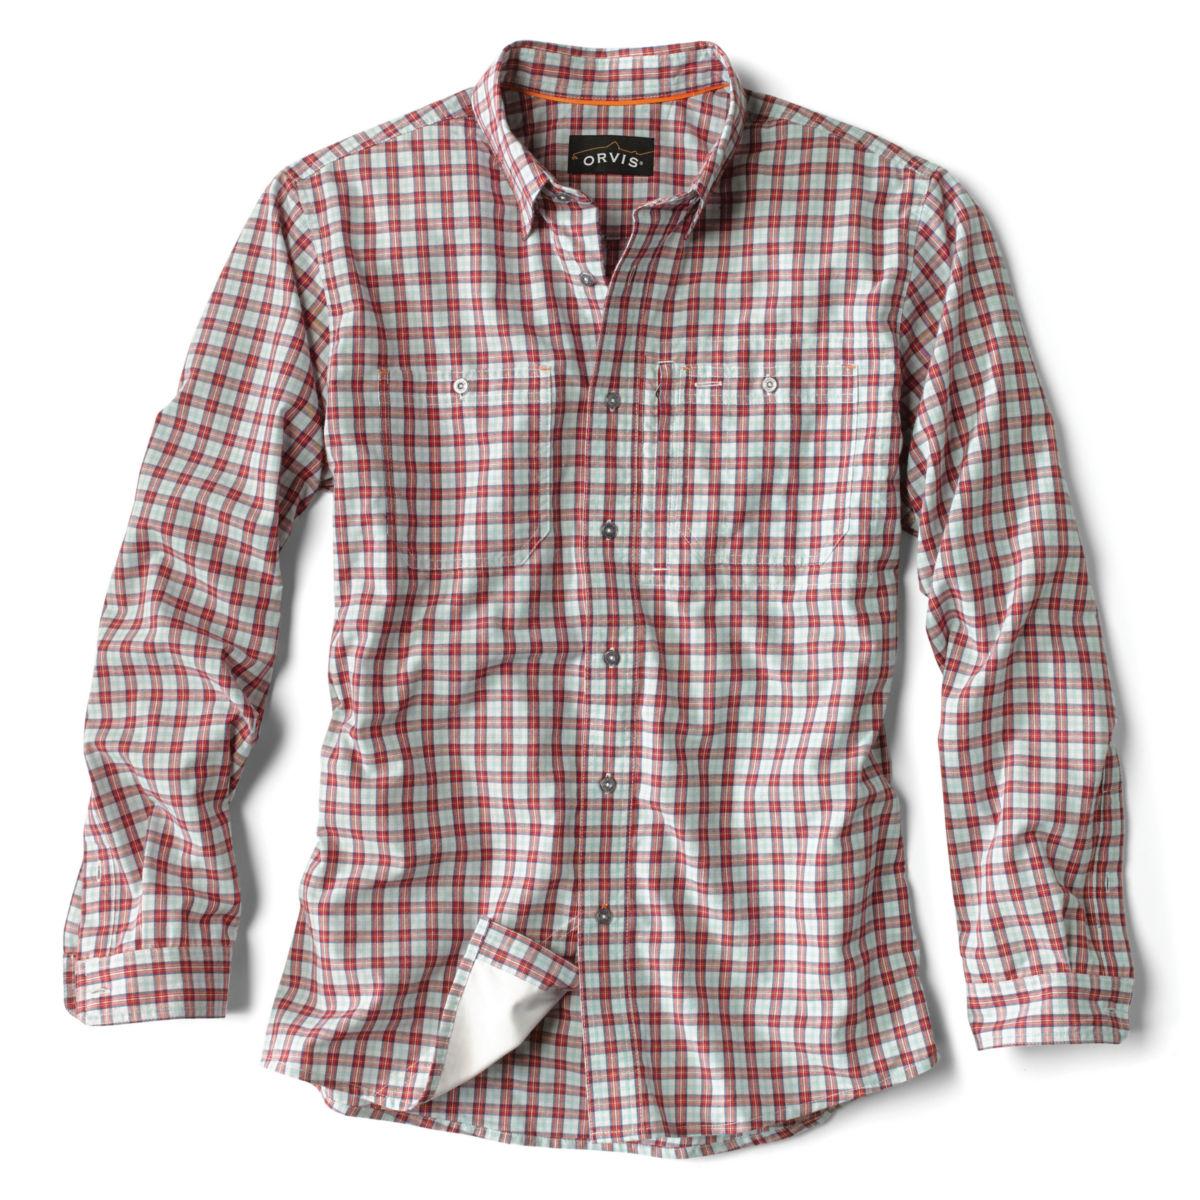 Flat Creek Plaid Shirt - RED PLAIDimage number 0